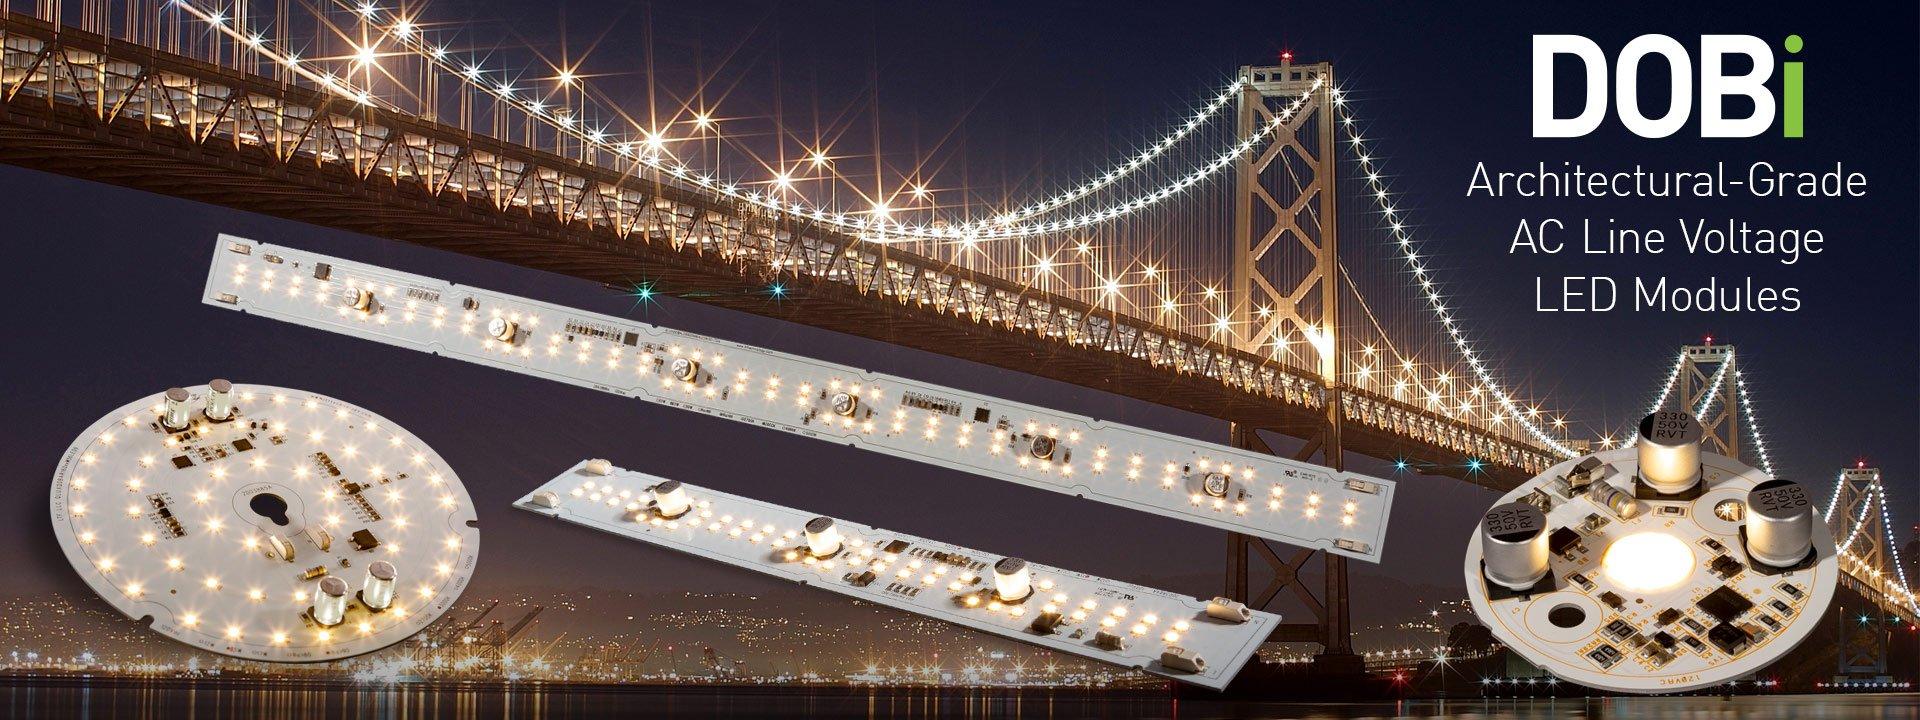 LTF's DOBi Architectural Grade AC Line Voltage LED Modules